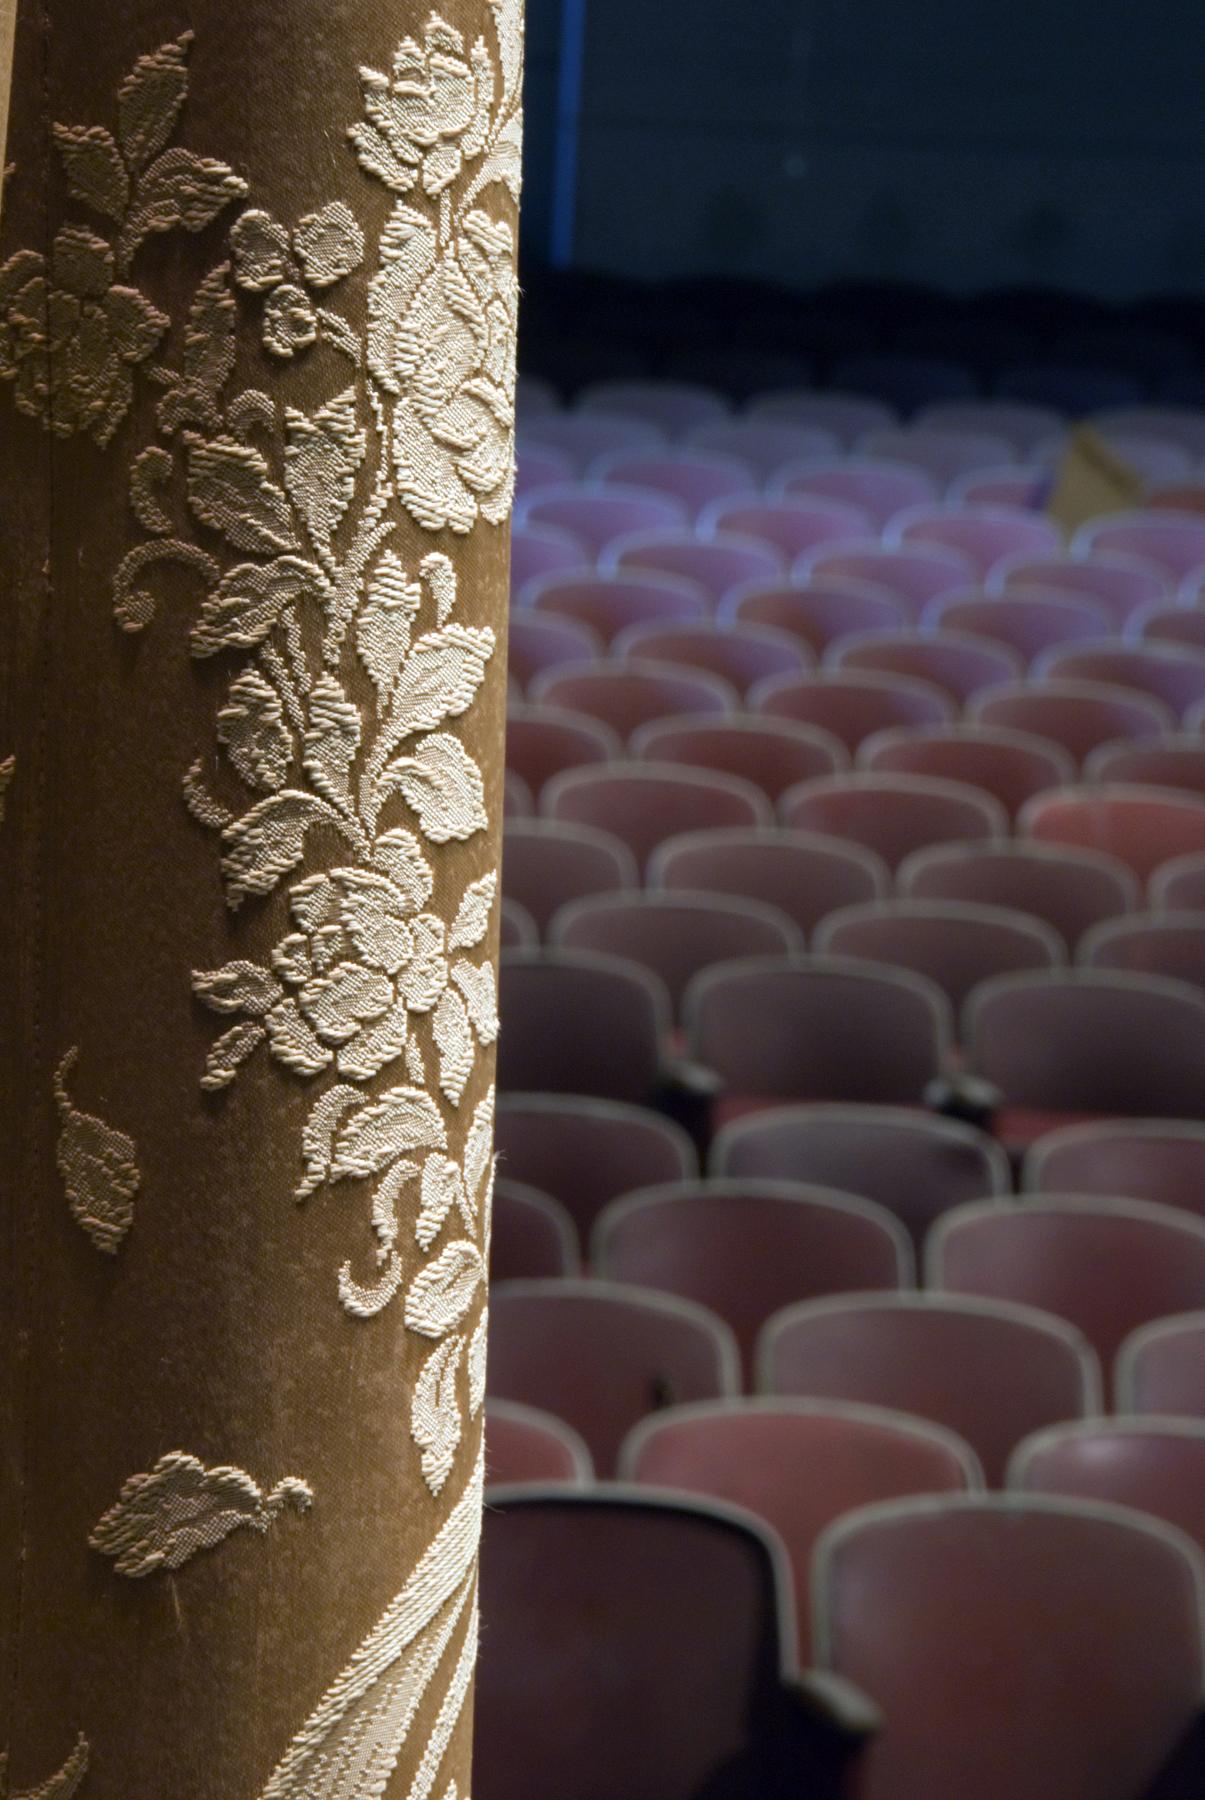 Curtain Close Up